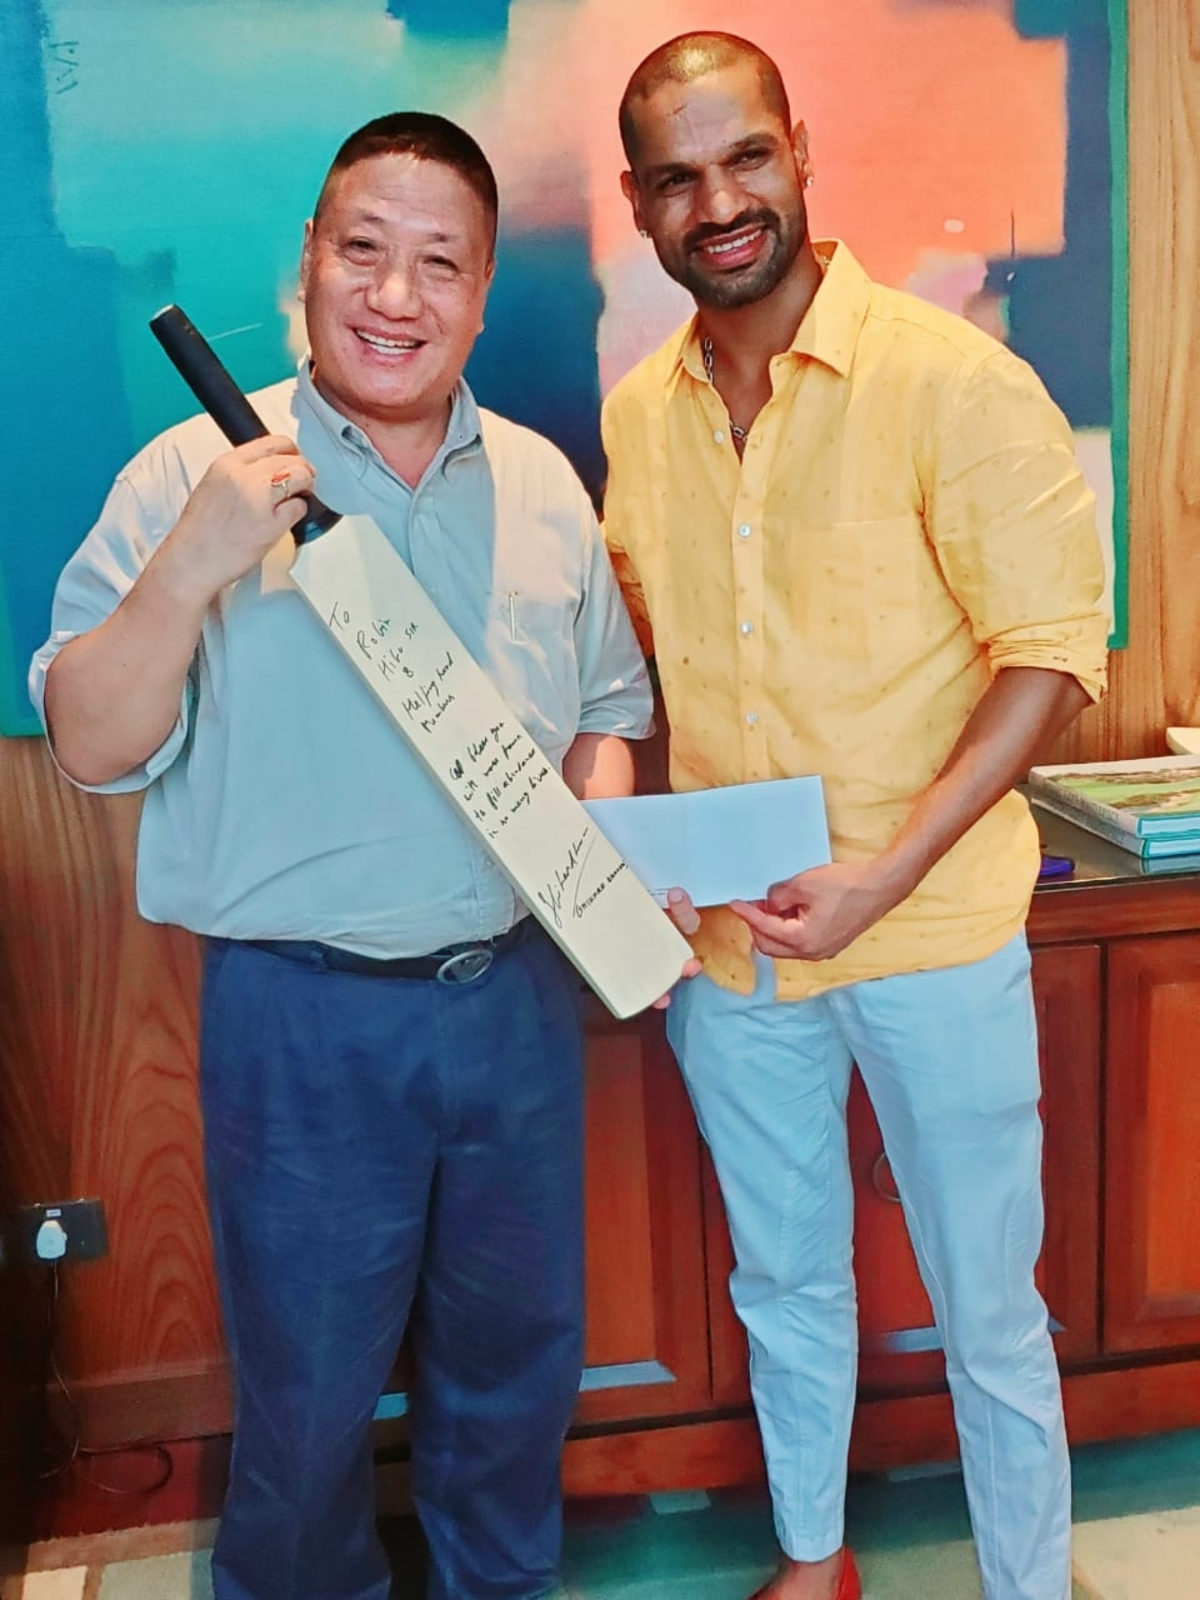 Shikhar Dhawan Groom NE Cricketers